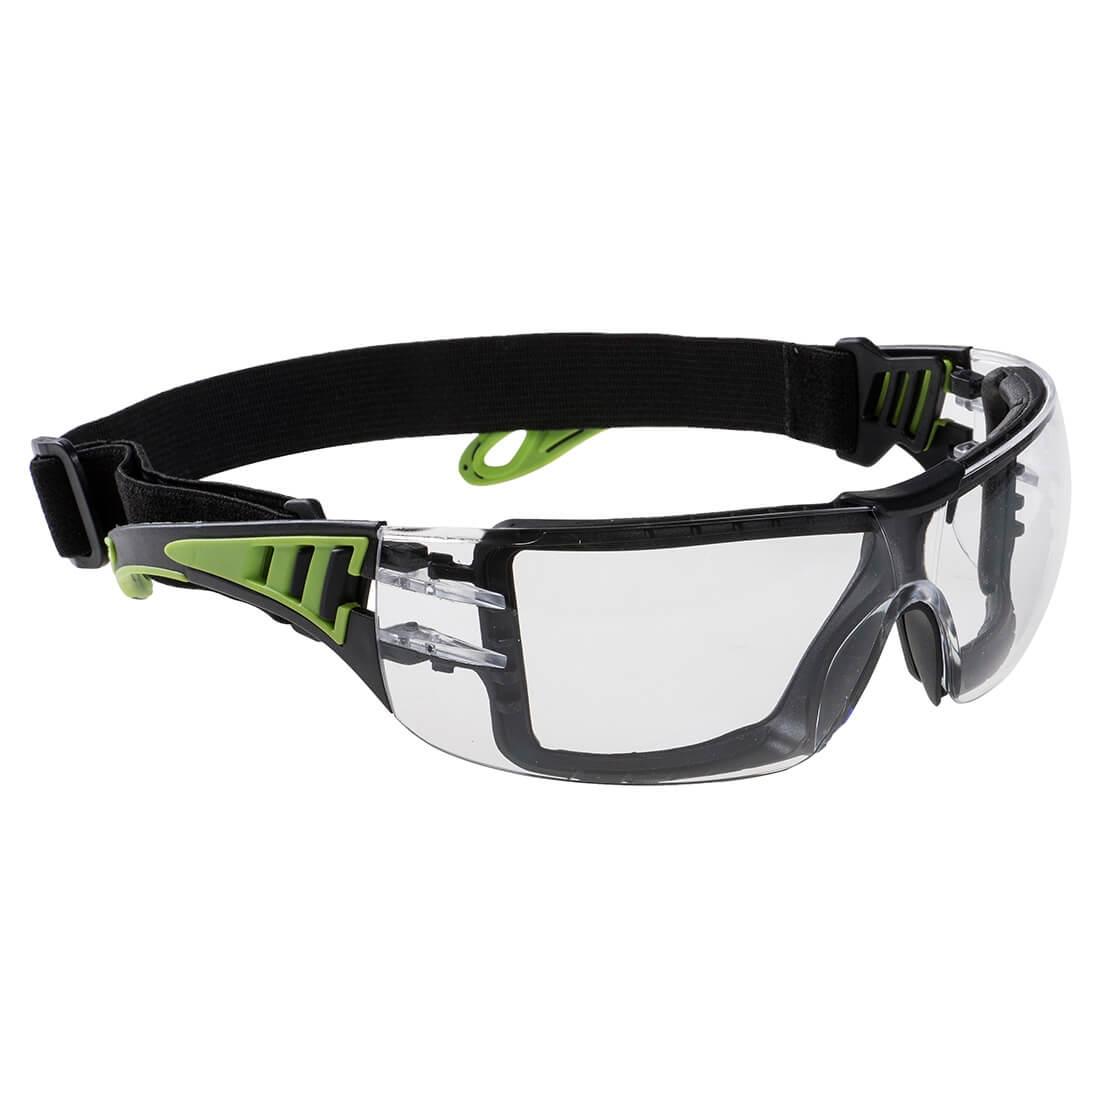 PW Tech Look Plus - Echipamente de protectie personala